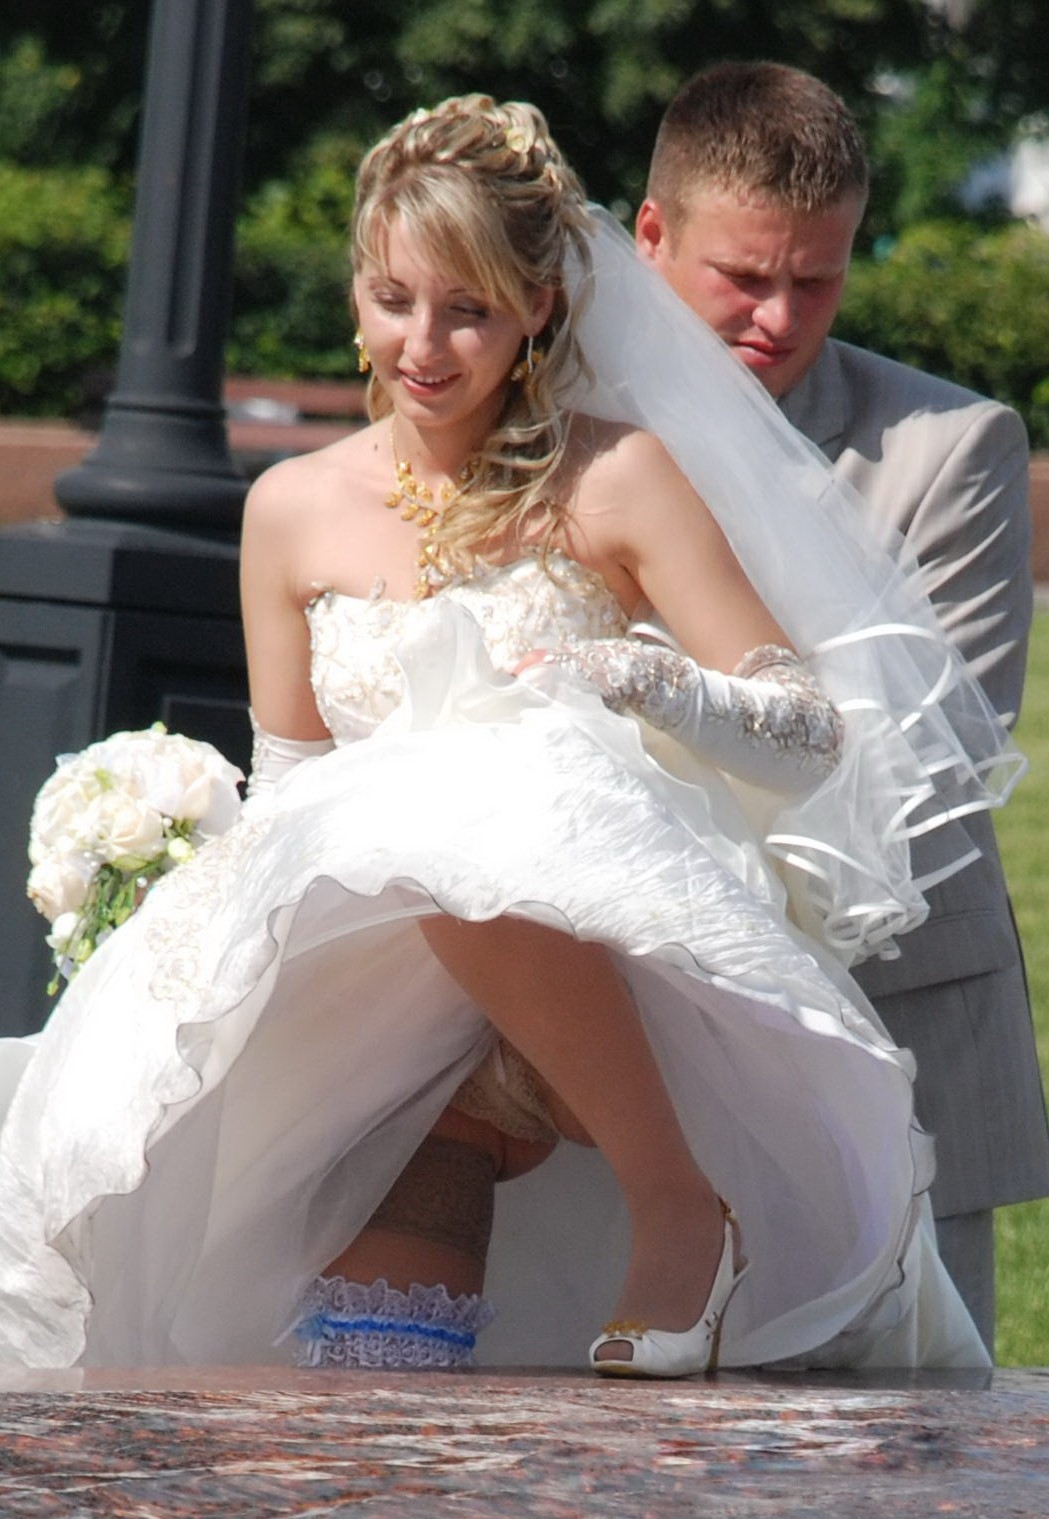 Kim kardashian bridal upskirt images orelsex